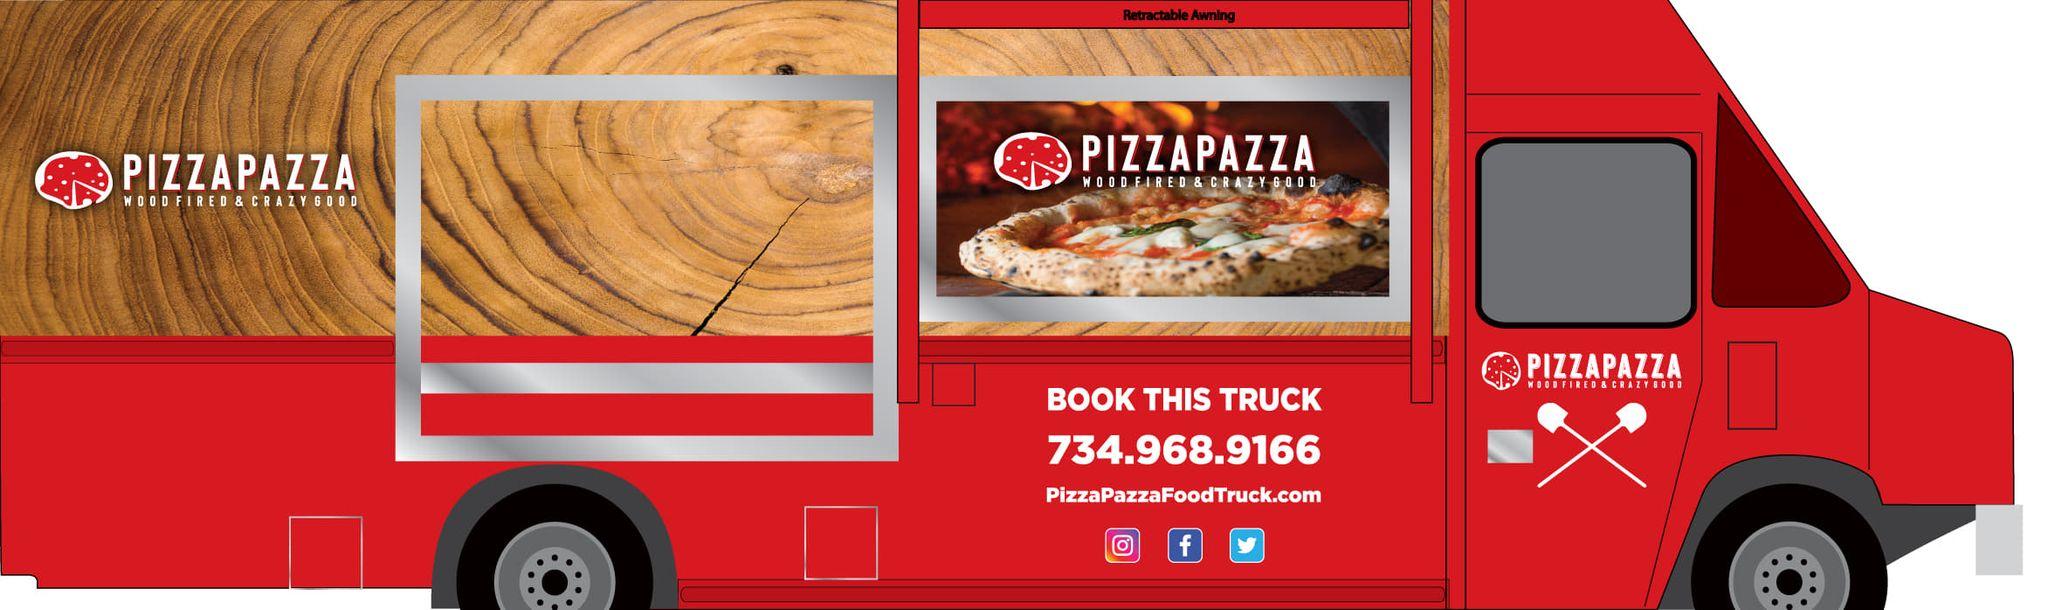 Best Food Truck In canton Michigan